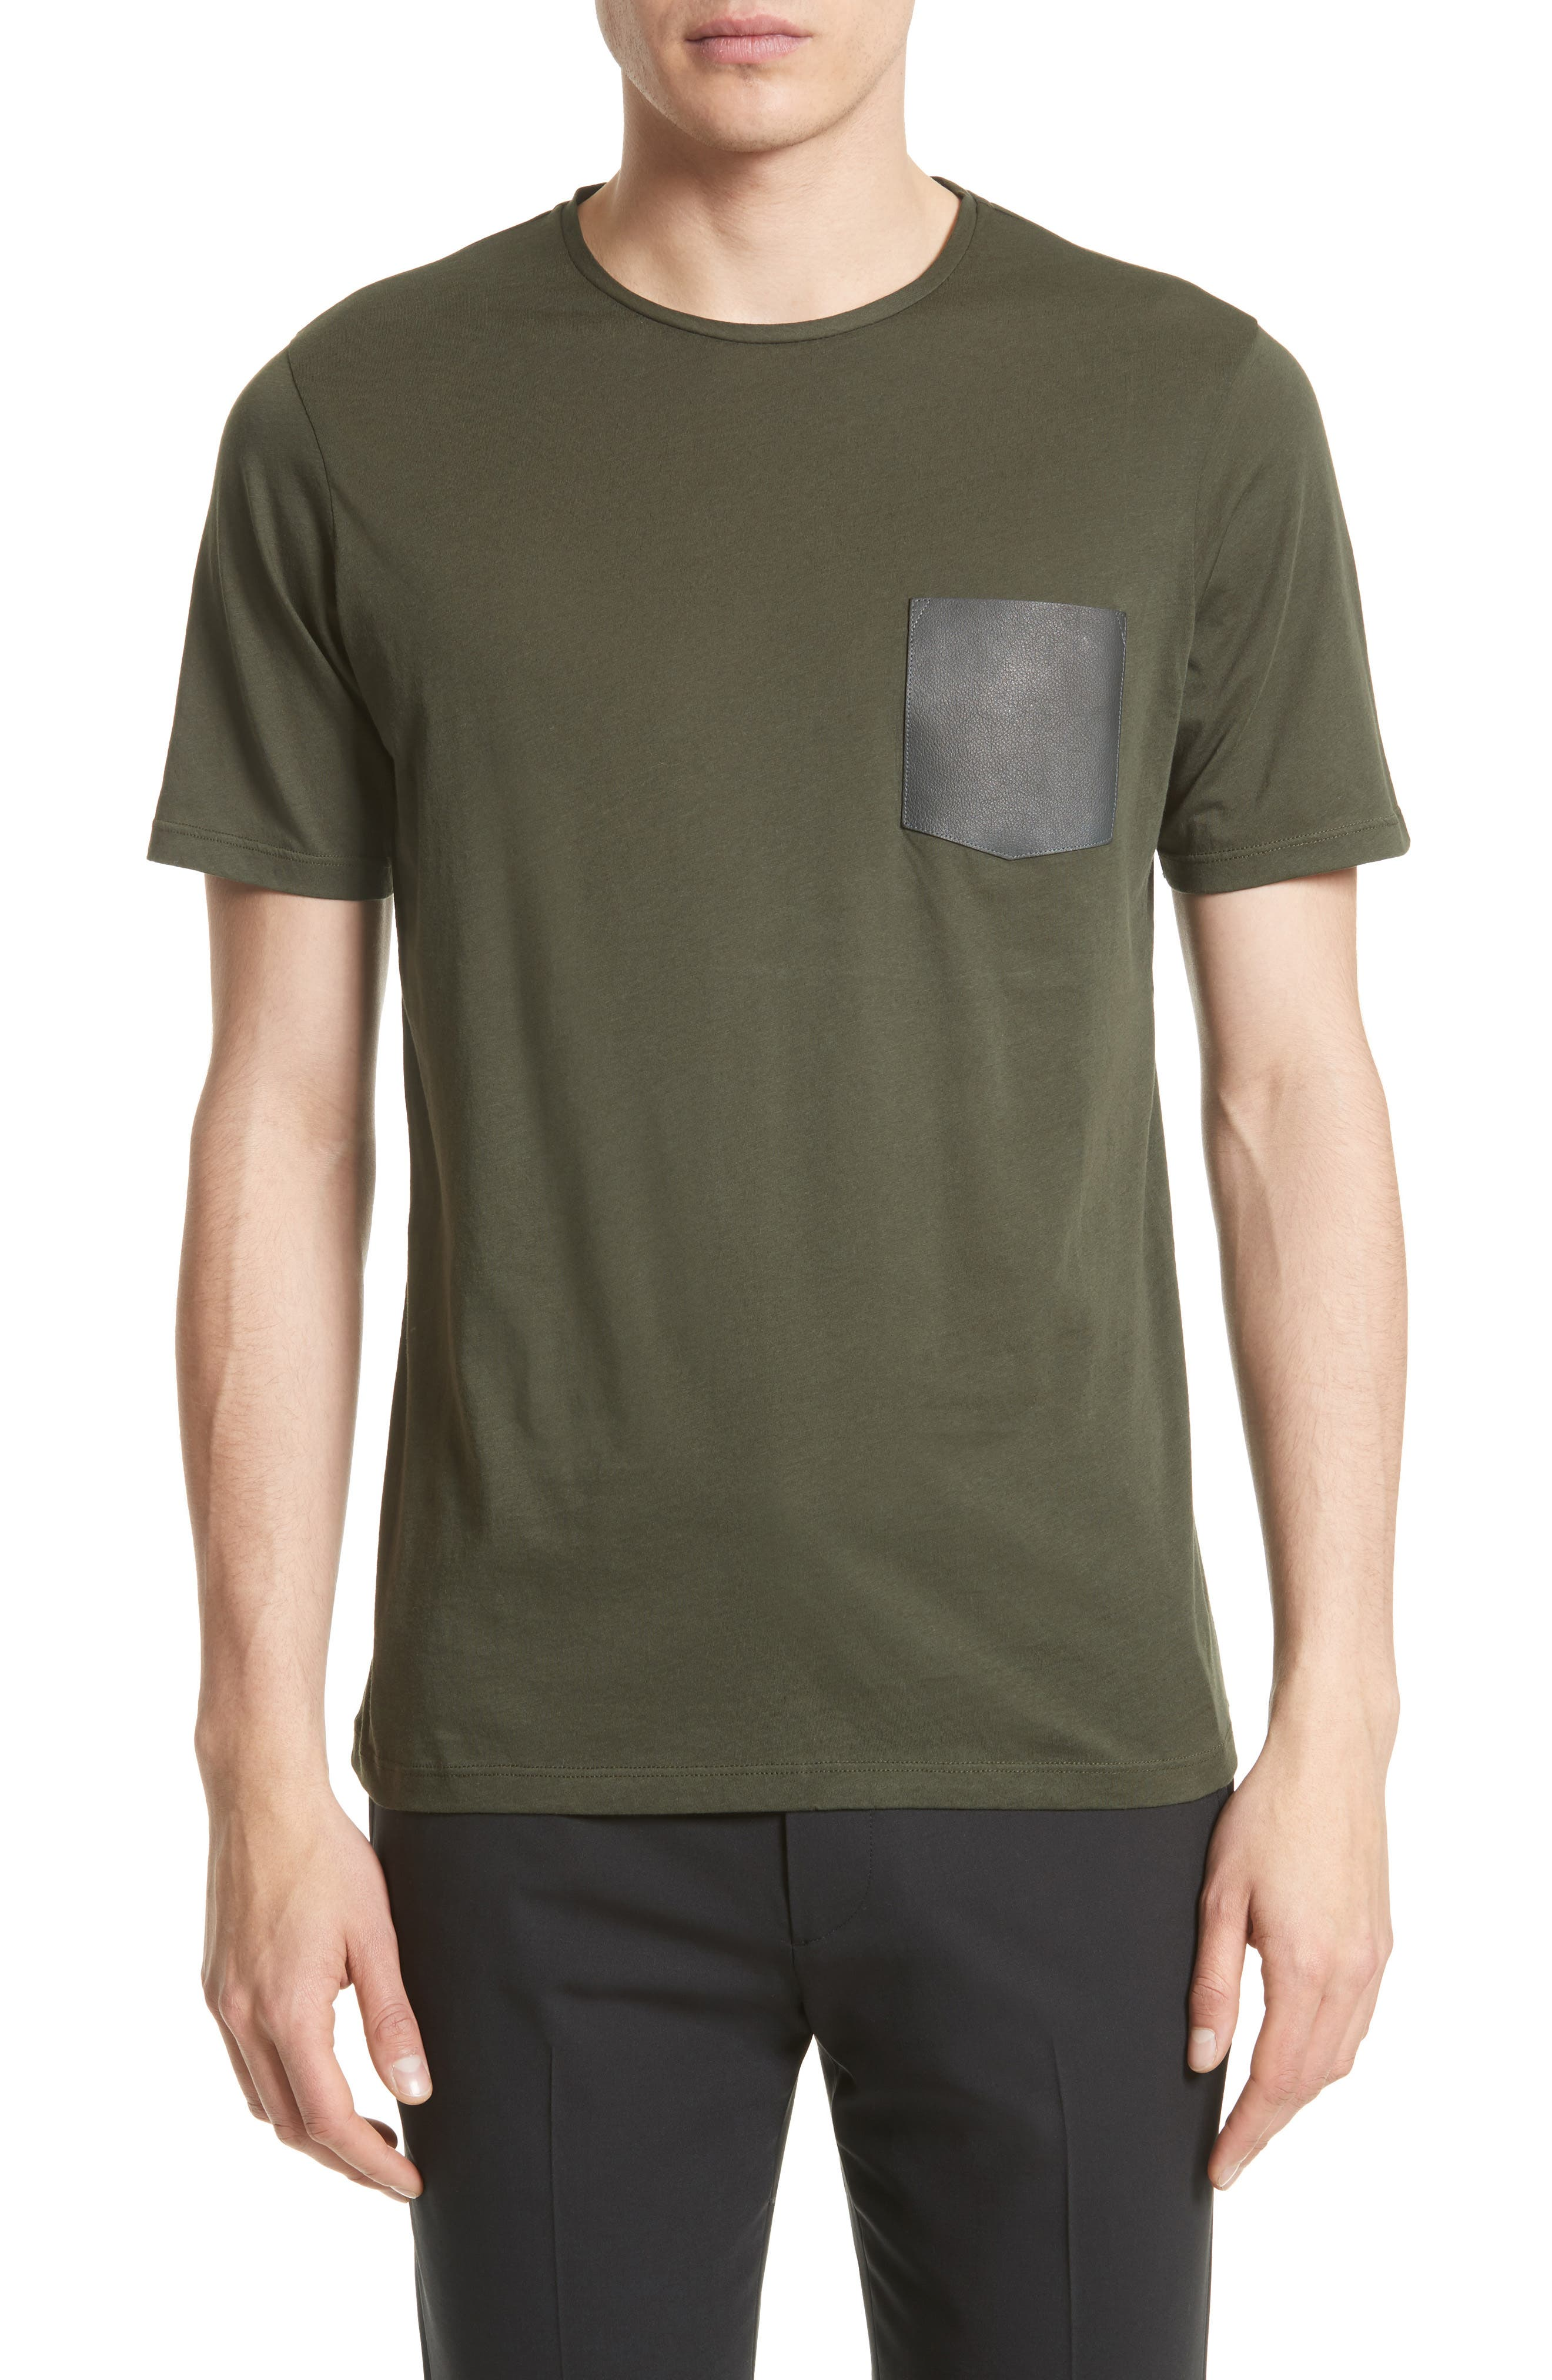 Main Image - The Kooples Leather Pocket T-Shirt